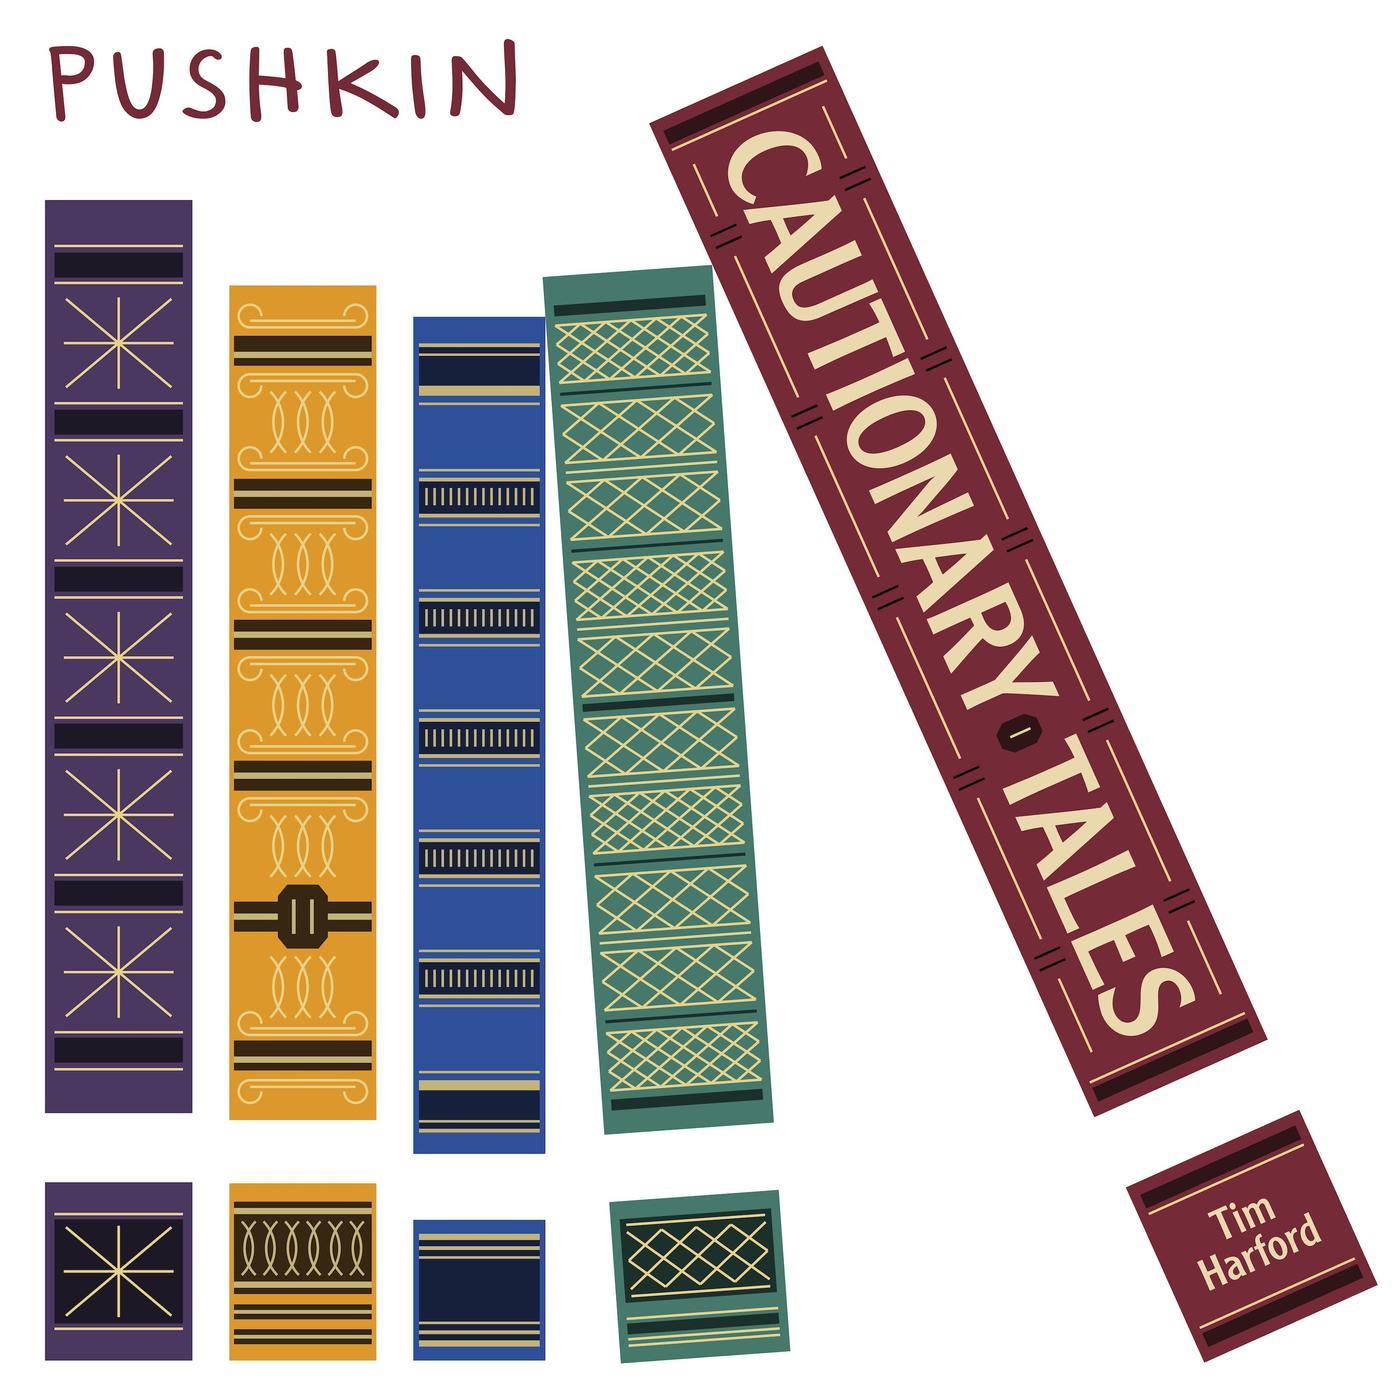 Pushkin Industries